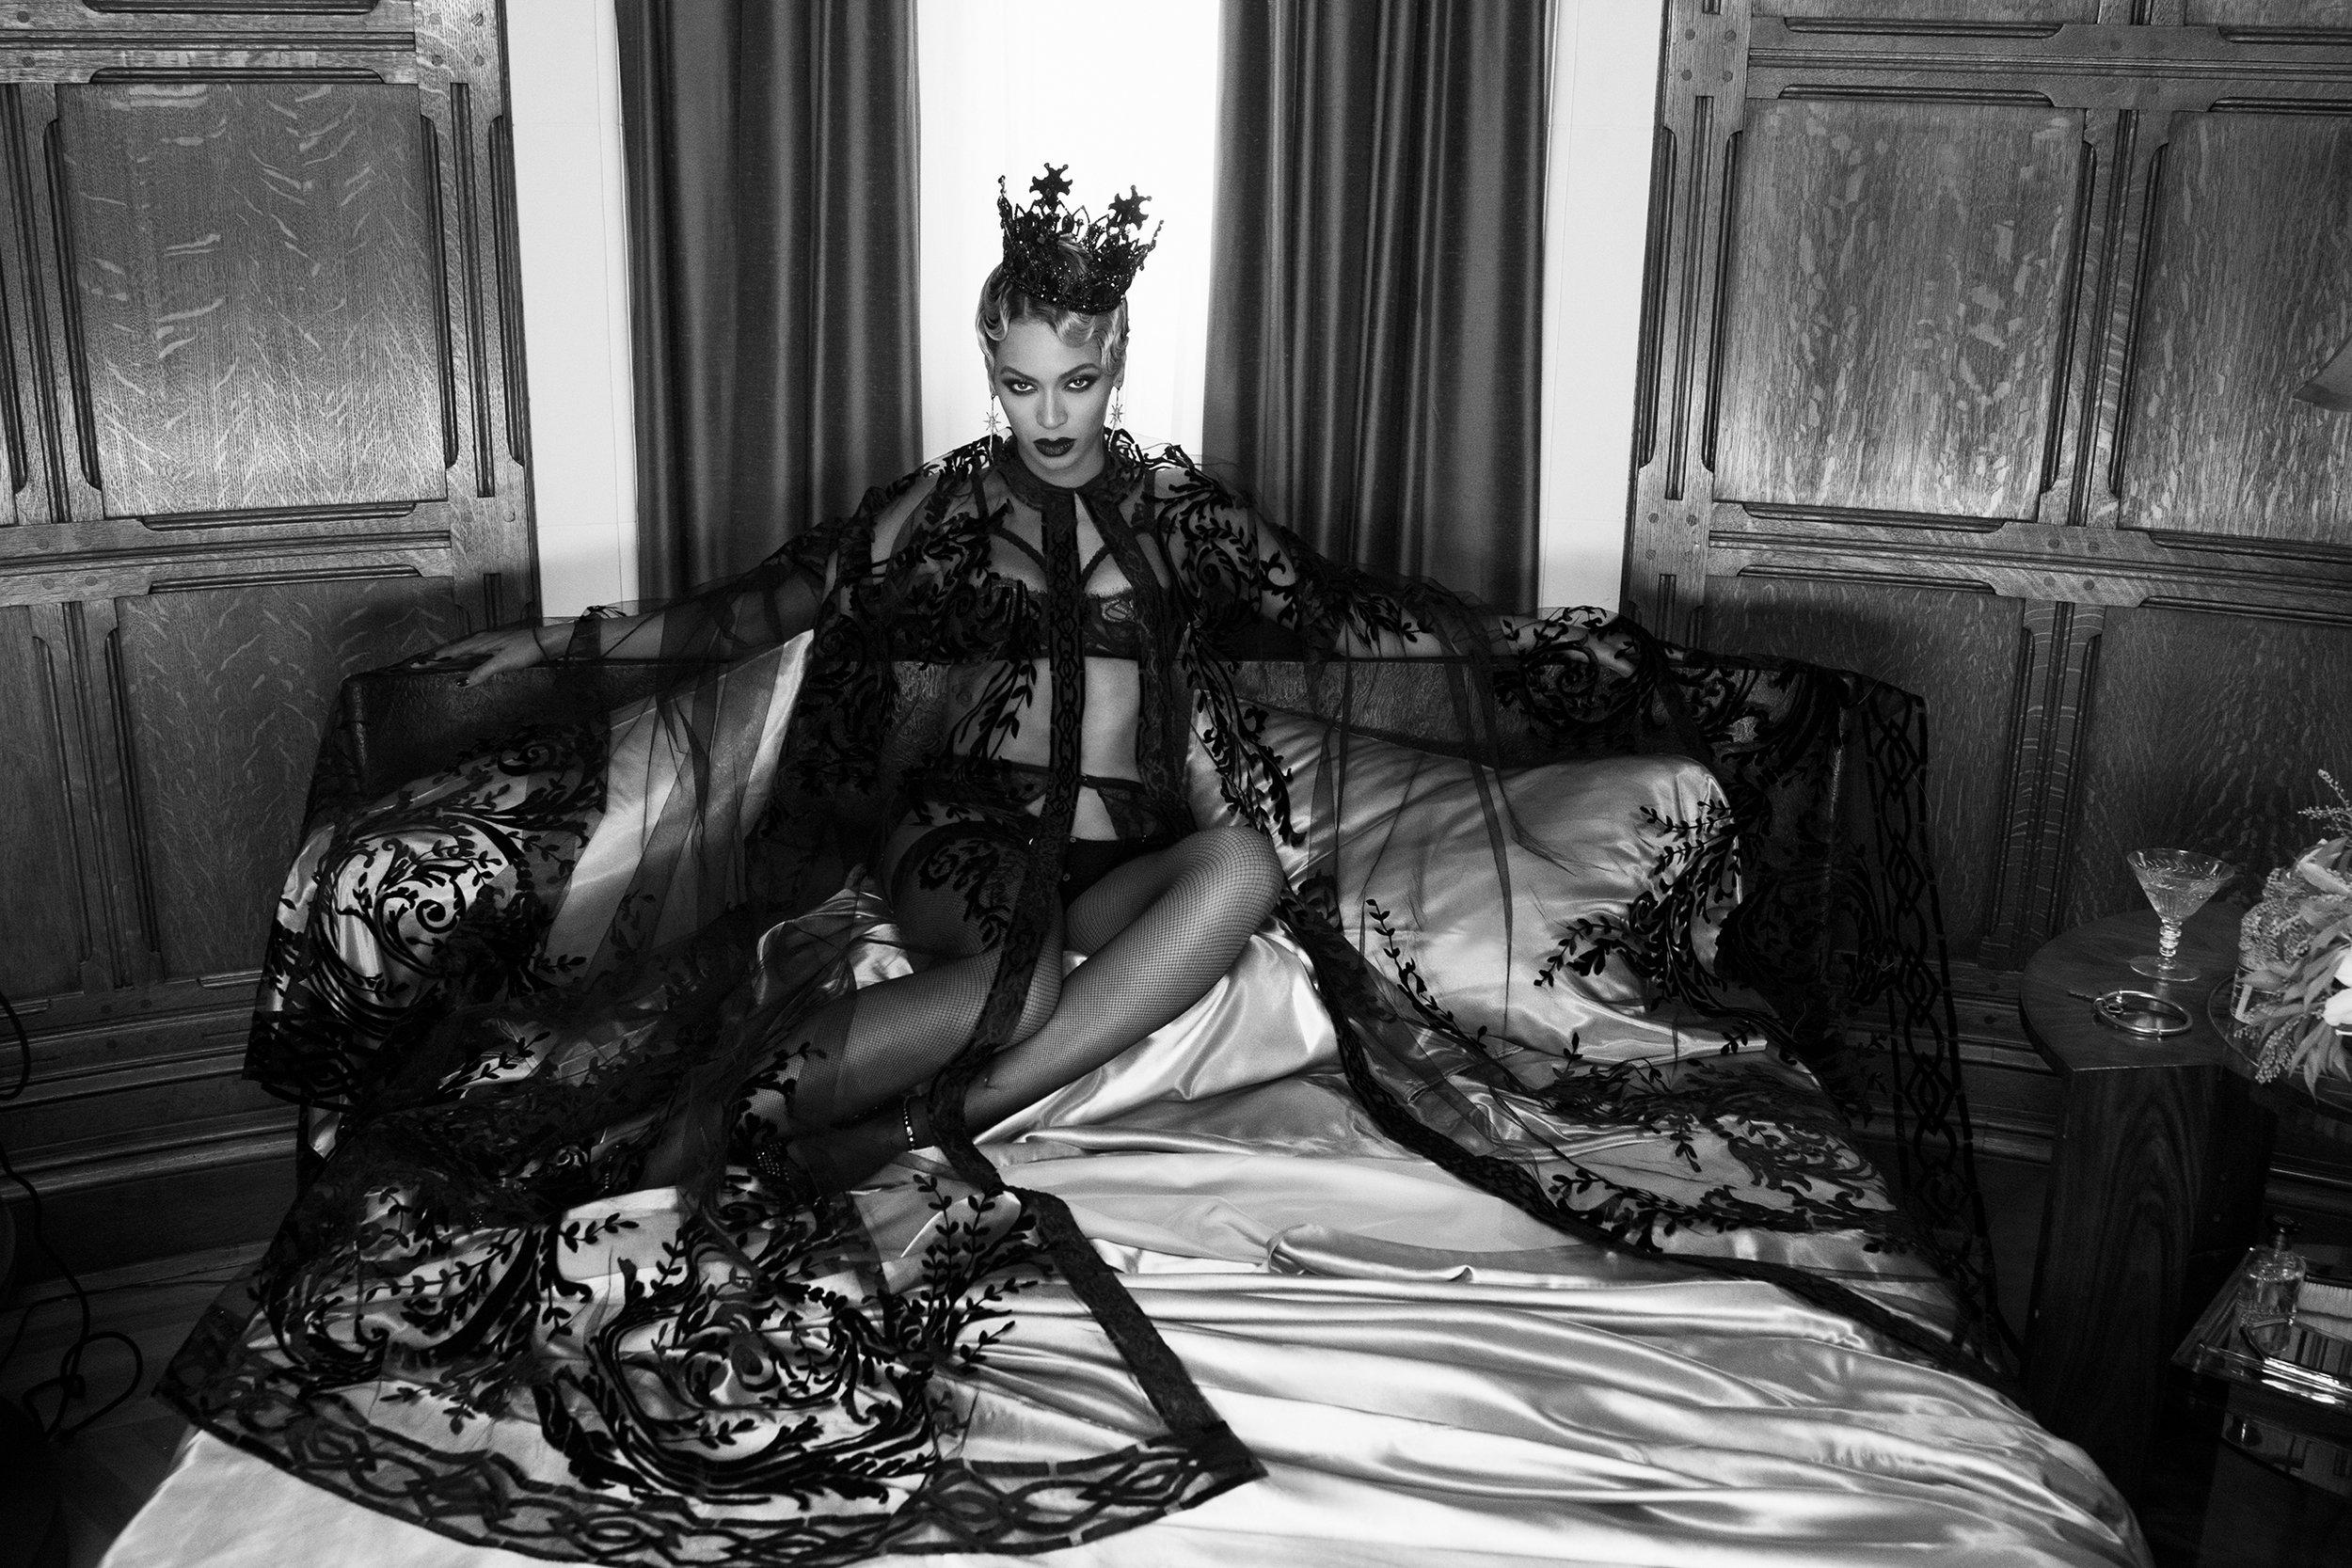 P_Beyonce_Book_49_AB3U1971.jpg